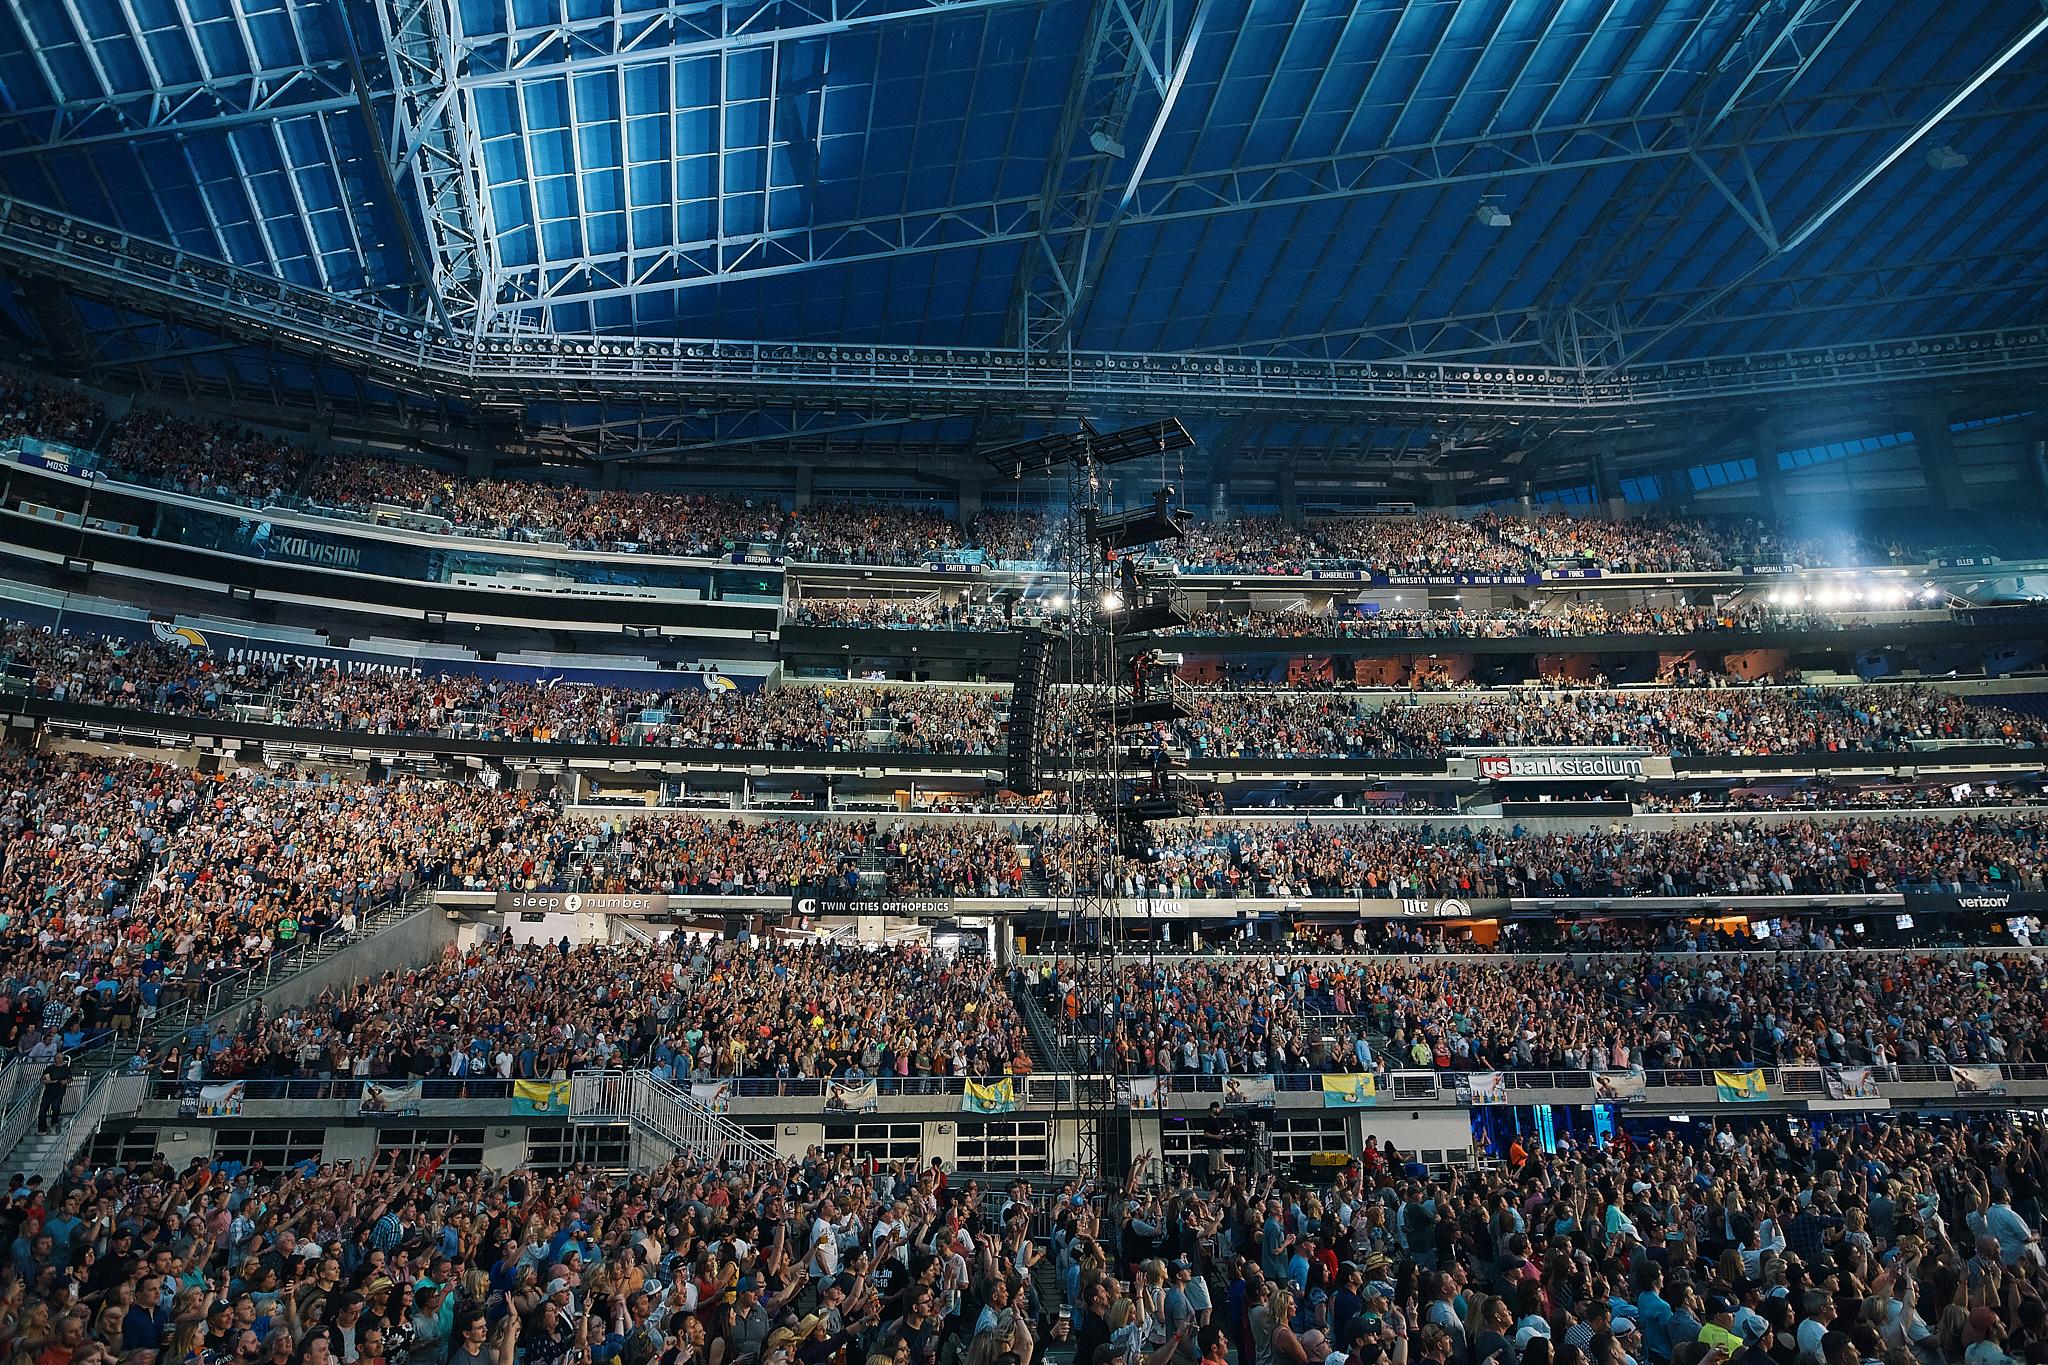 Kenny_Chesney_At_US_Bank_Stadium_On_05-05-2018_Photo_By_Joe_Lemke_004.jpg